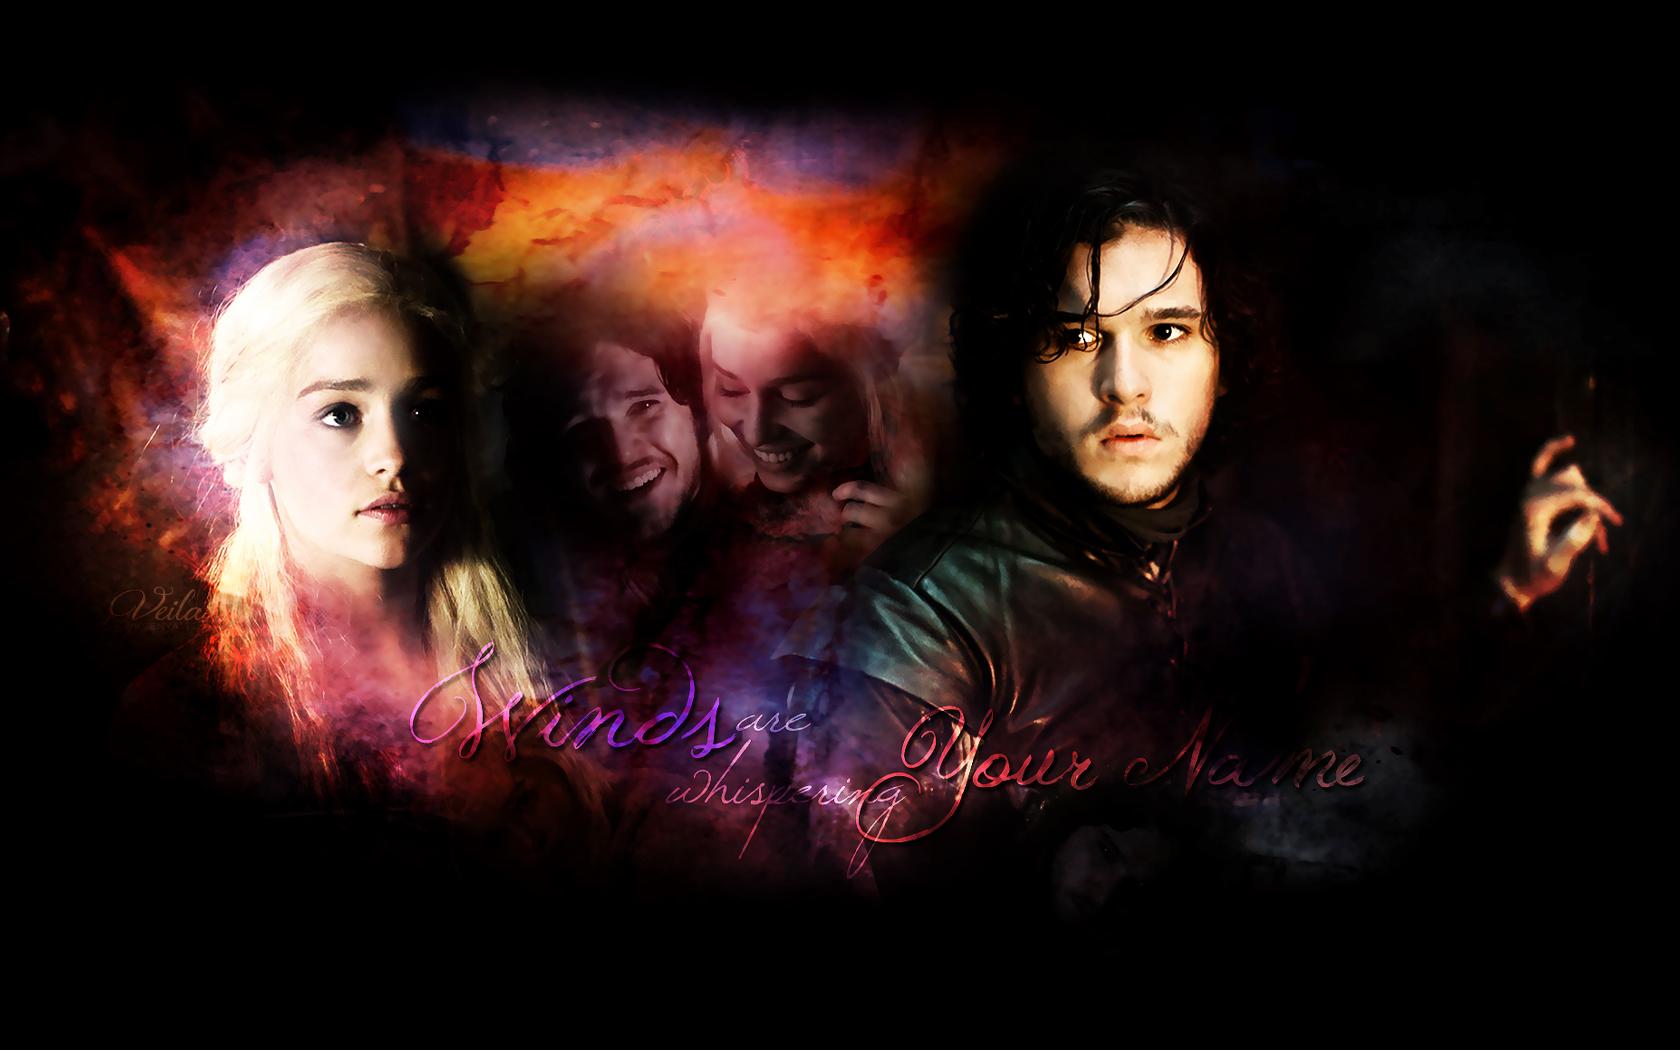 Daenerys Targaryen Jon Snow Game Of Thrones Wallpaper